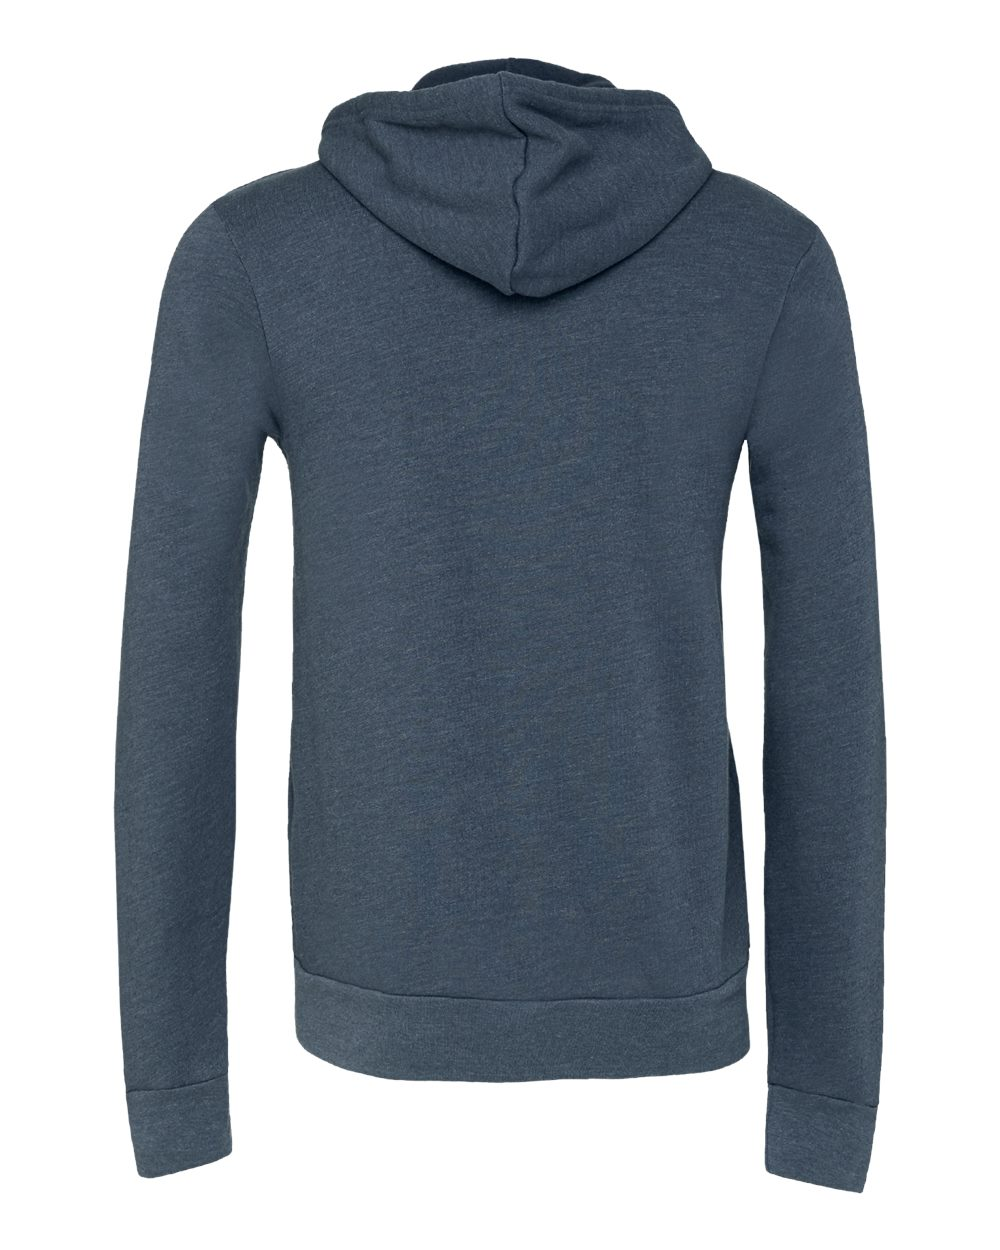 Bella-Canvas-Unisex-Full-Zip-Up-Hooded-Sweatshirt-Blank-Hoodie-3739-up-to-3XL thumbnail 47